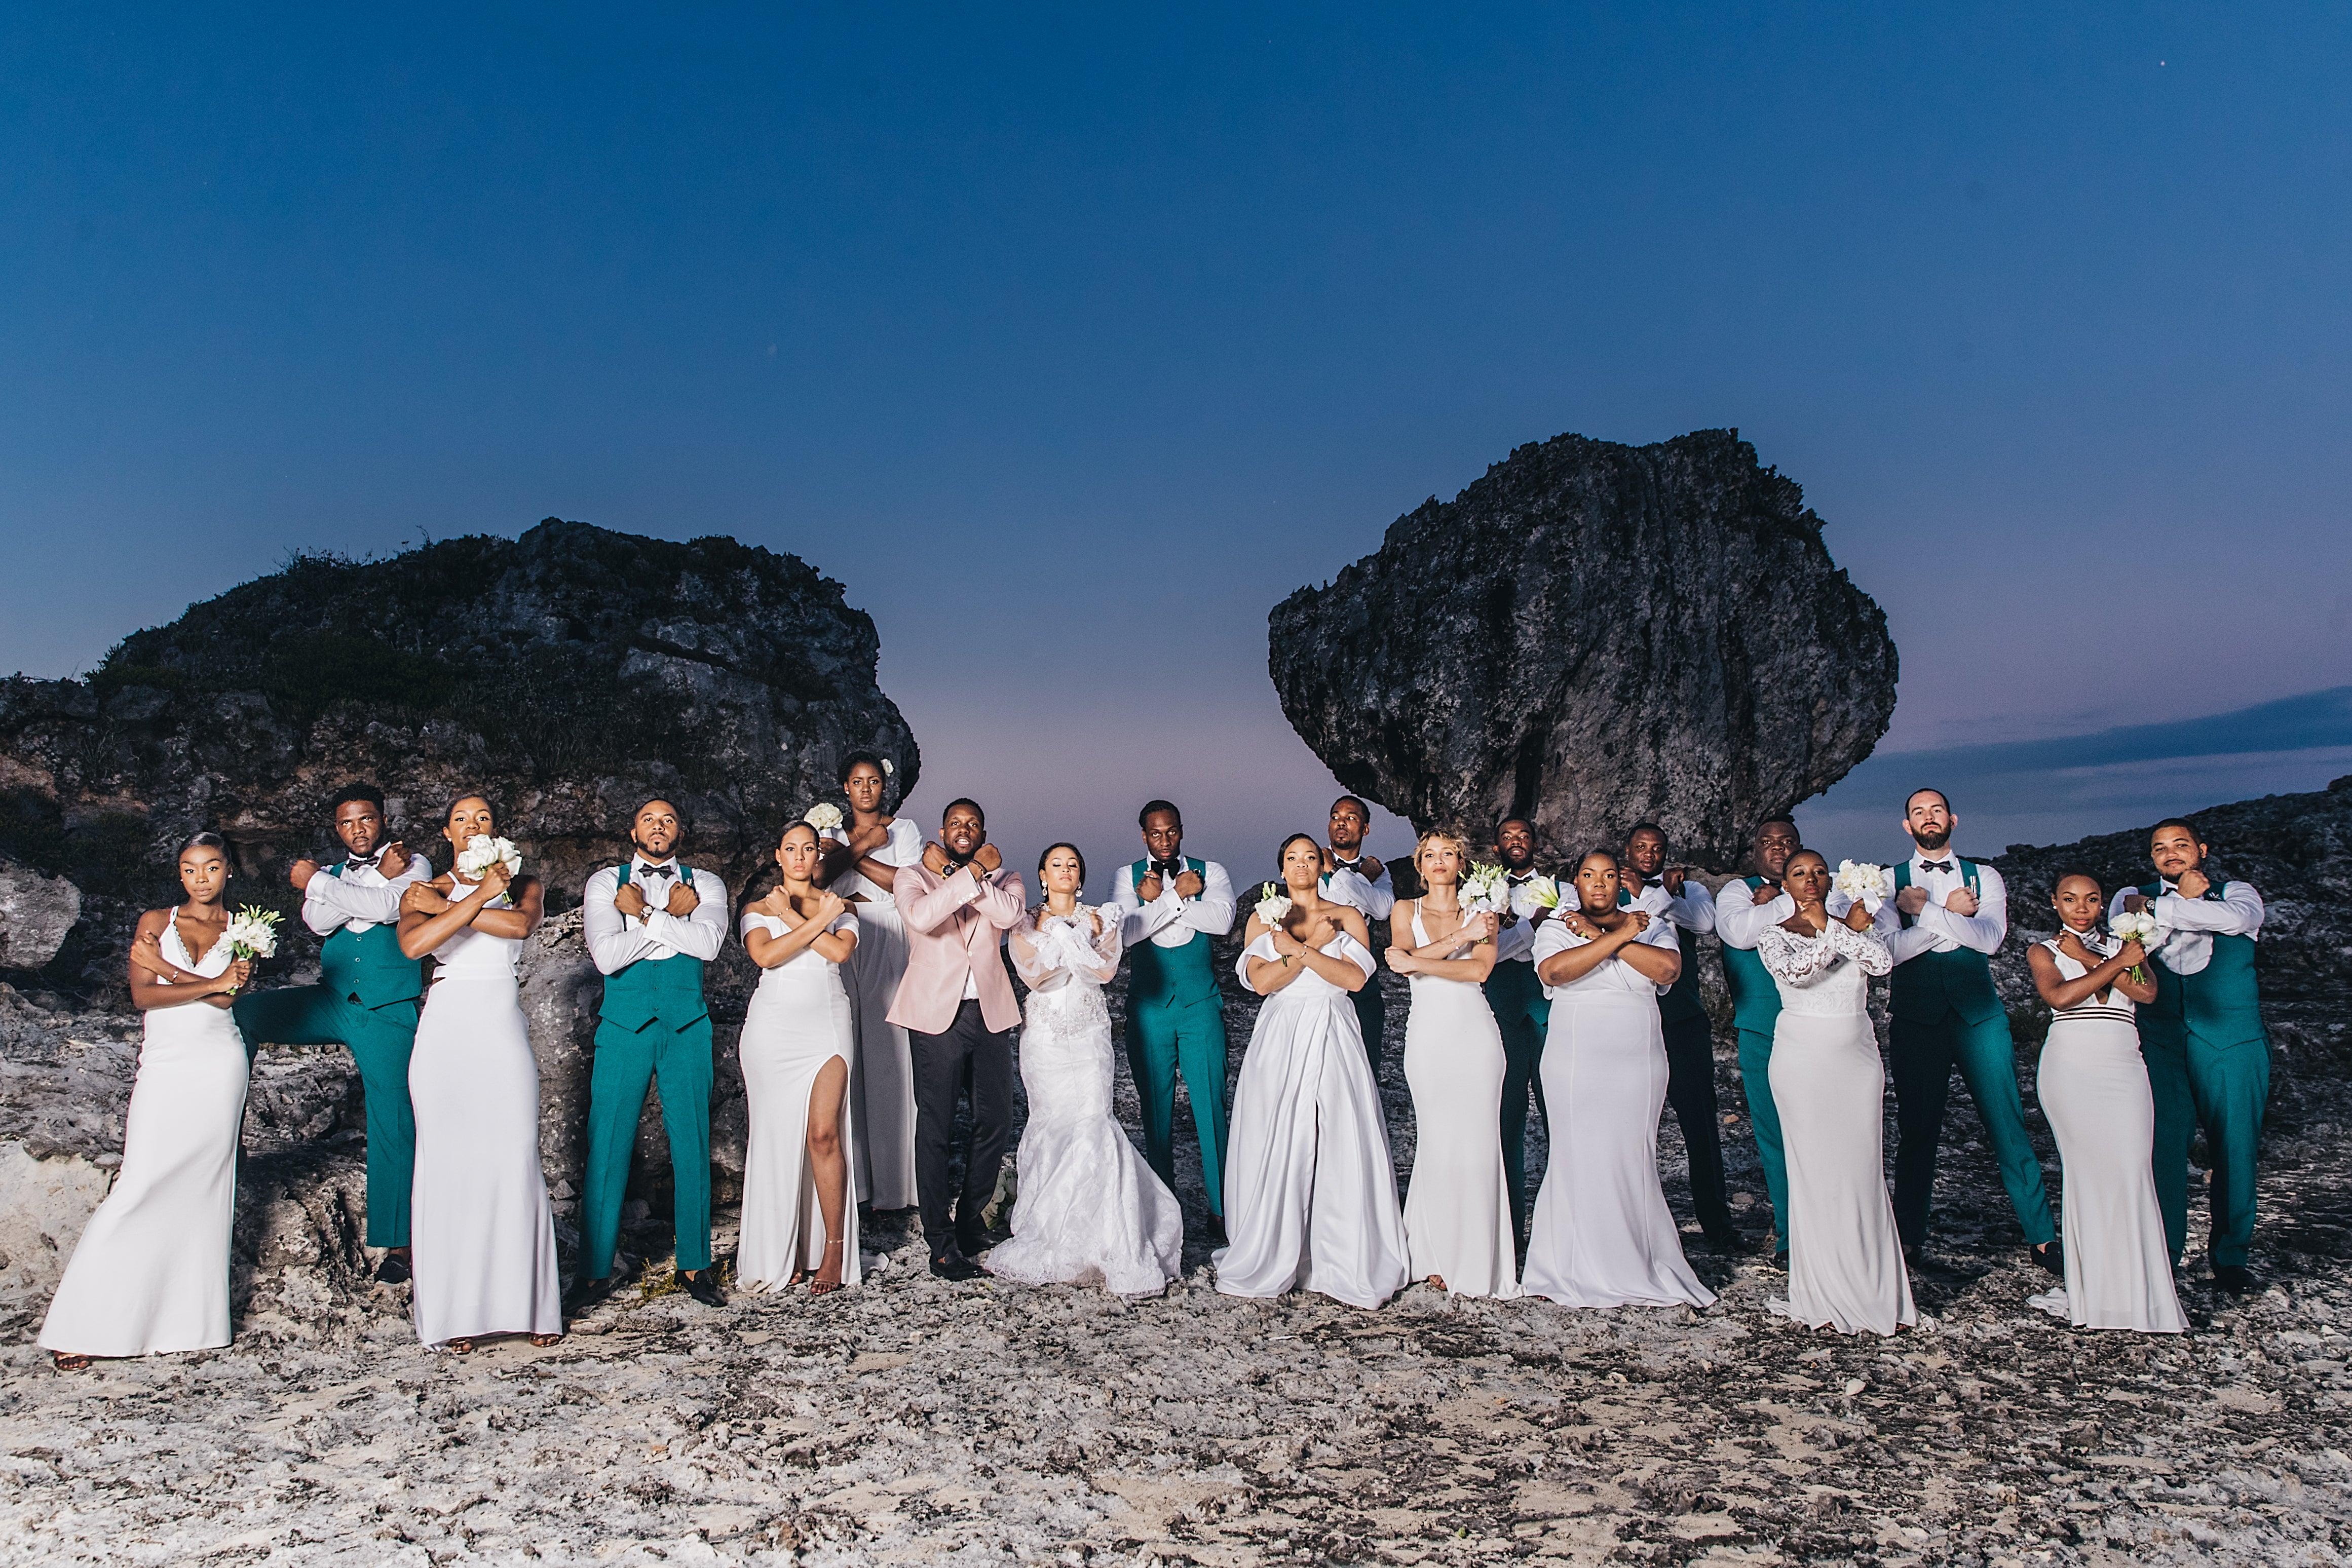 Bridal Bliss: Ian And Zemi's Island Chic Bahamas Wedding Will Take Your Breath Away